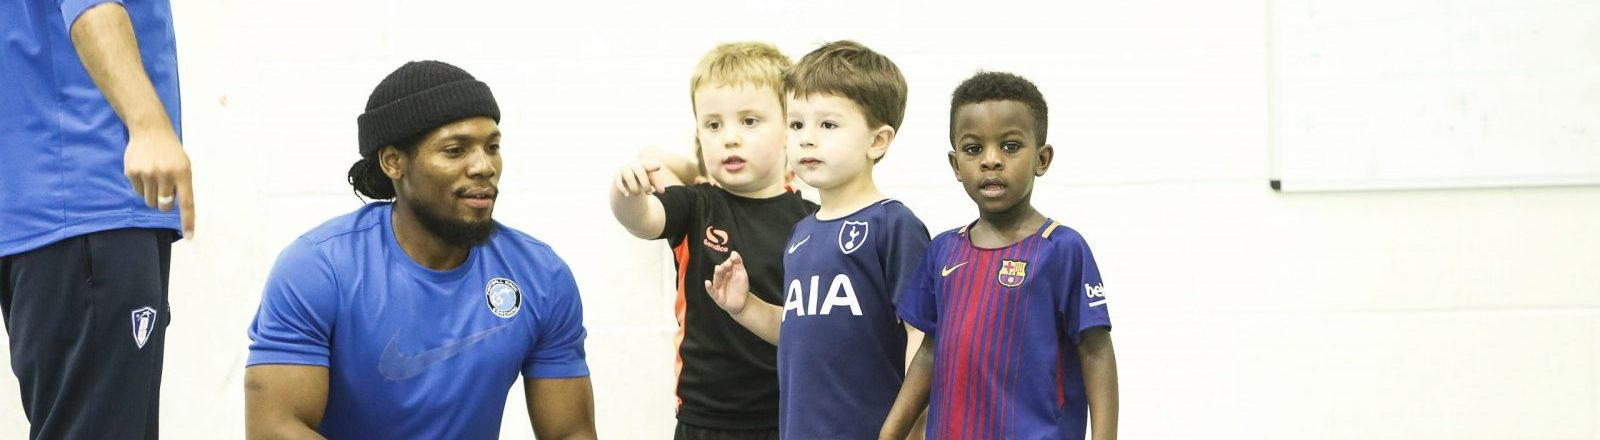 Kids Football Parties